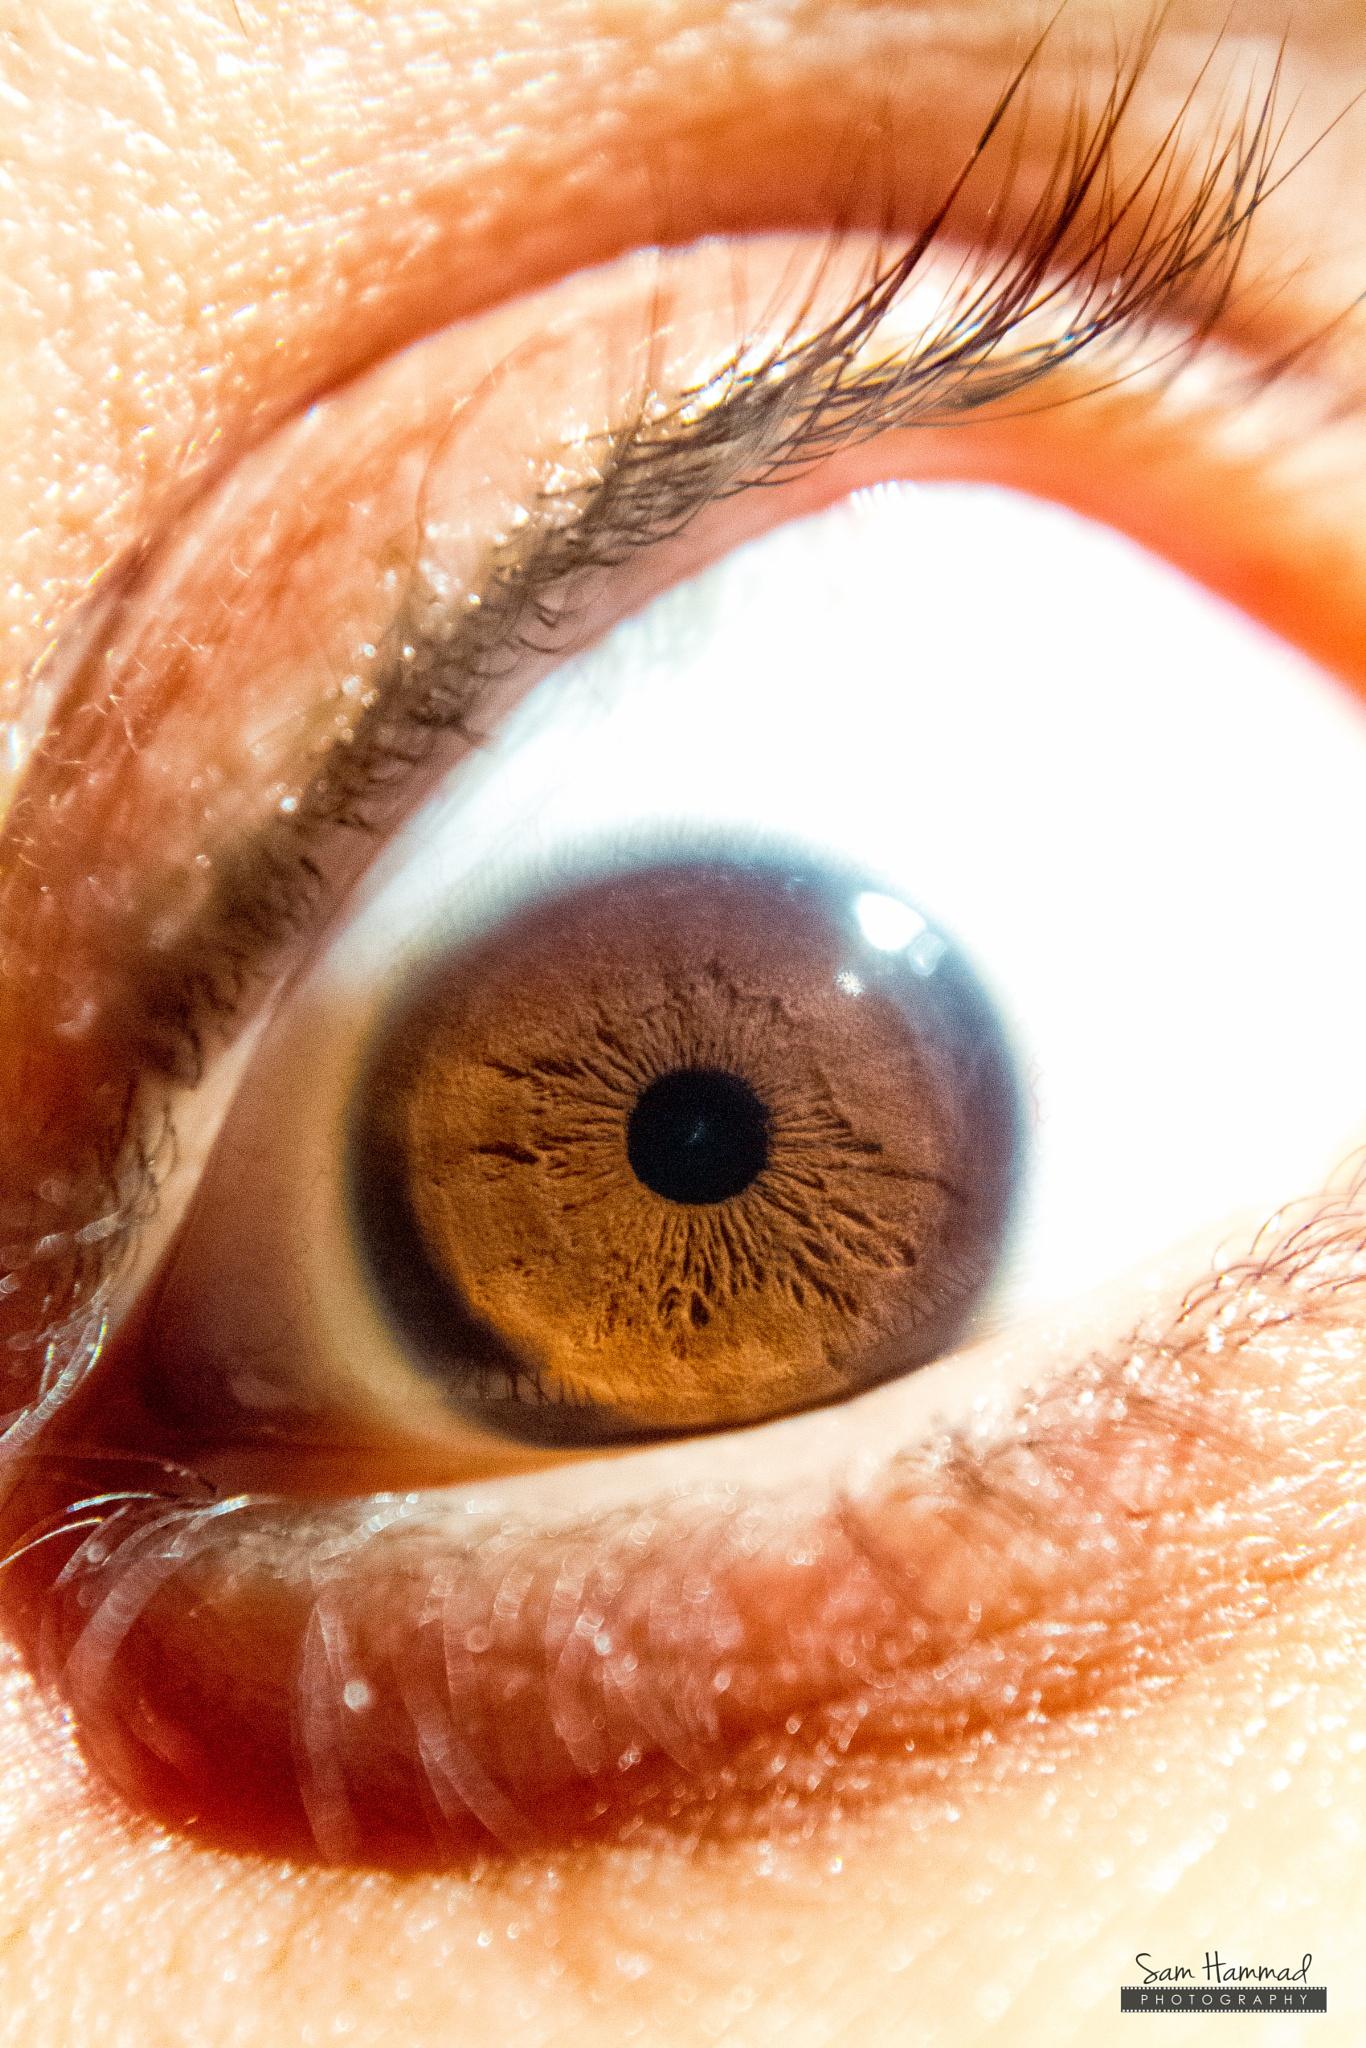 Evil Eye by Sam Hammad